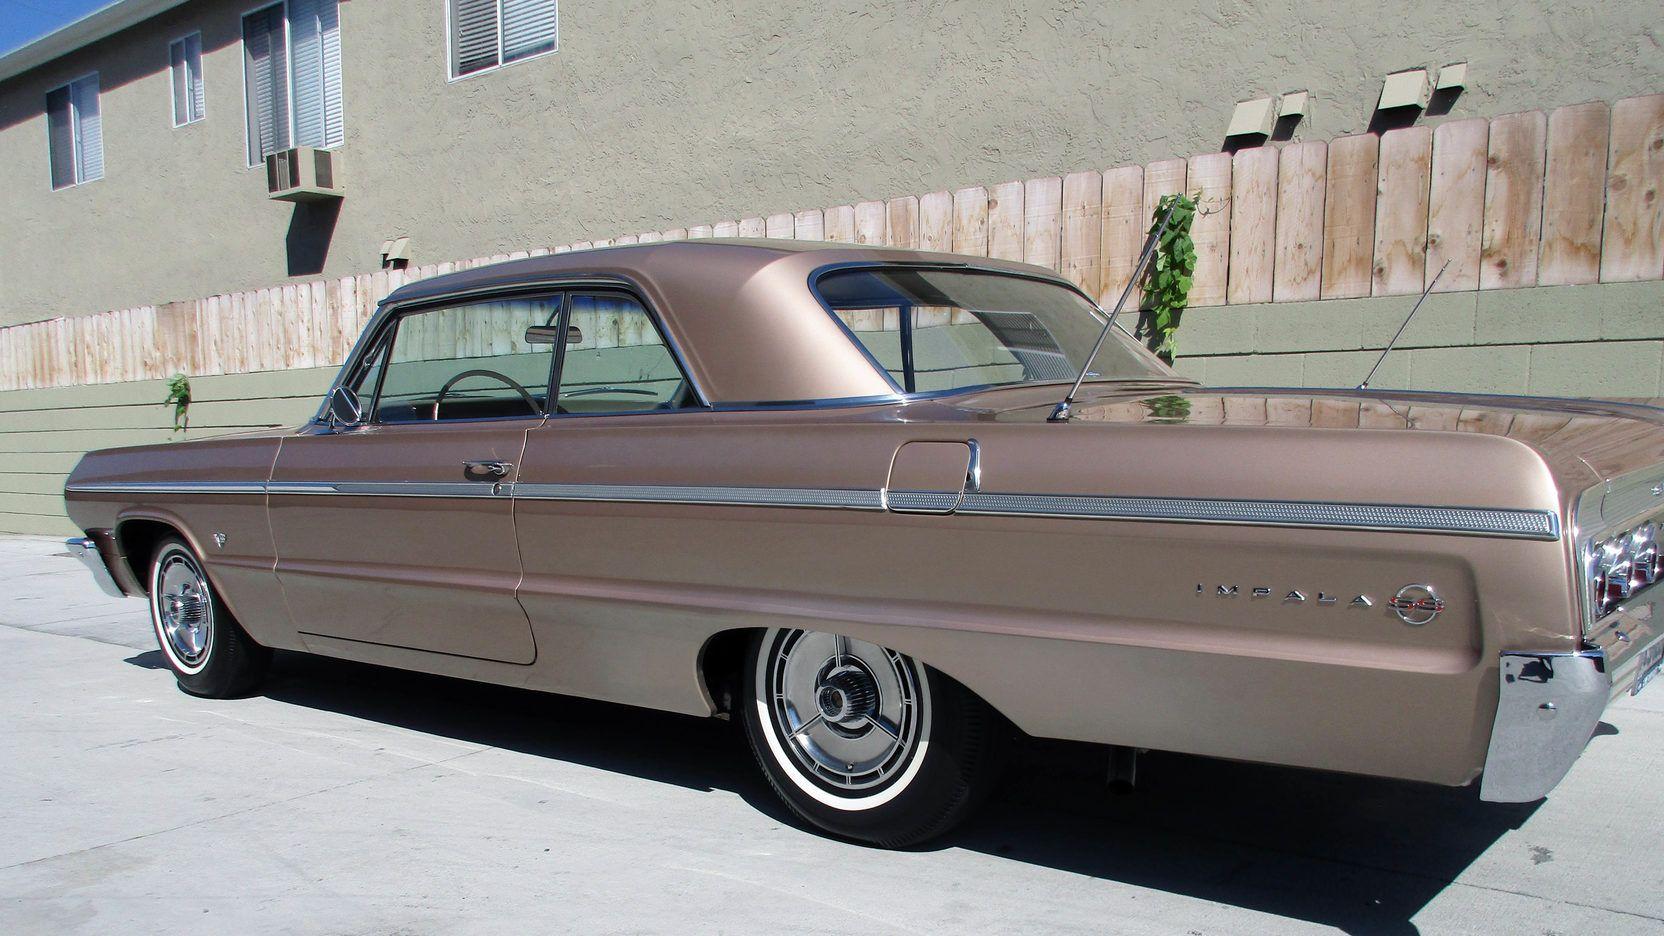 1964 Chevrolet Impala SS | F56 | Anaheim 2015 | Mecum Auctions